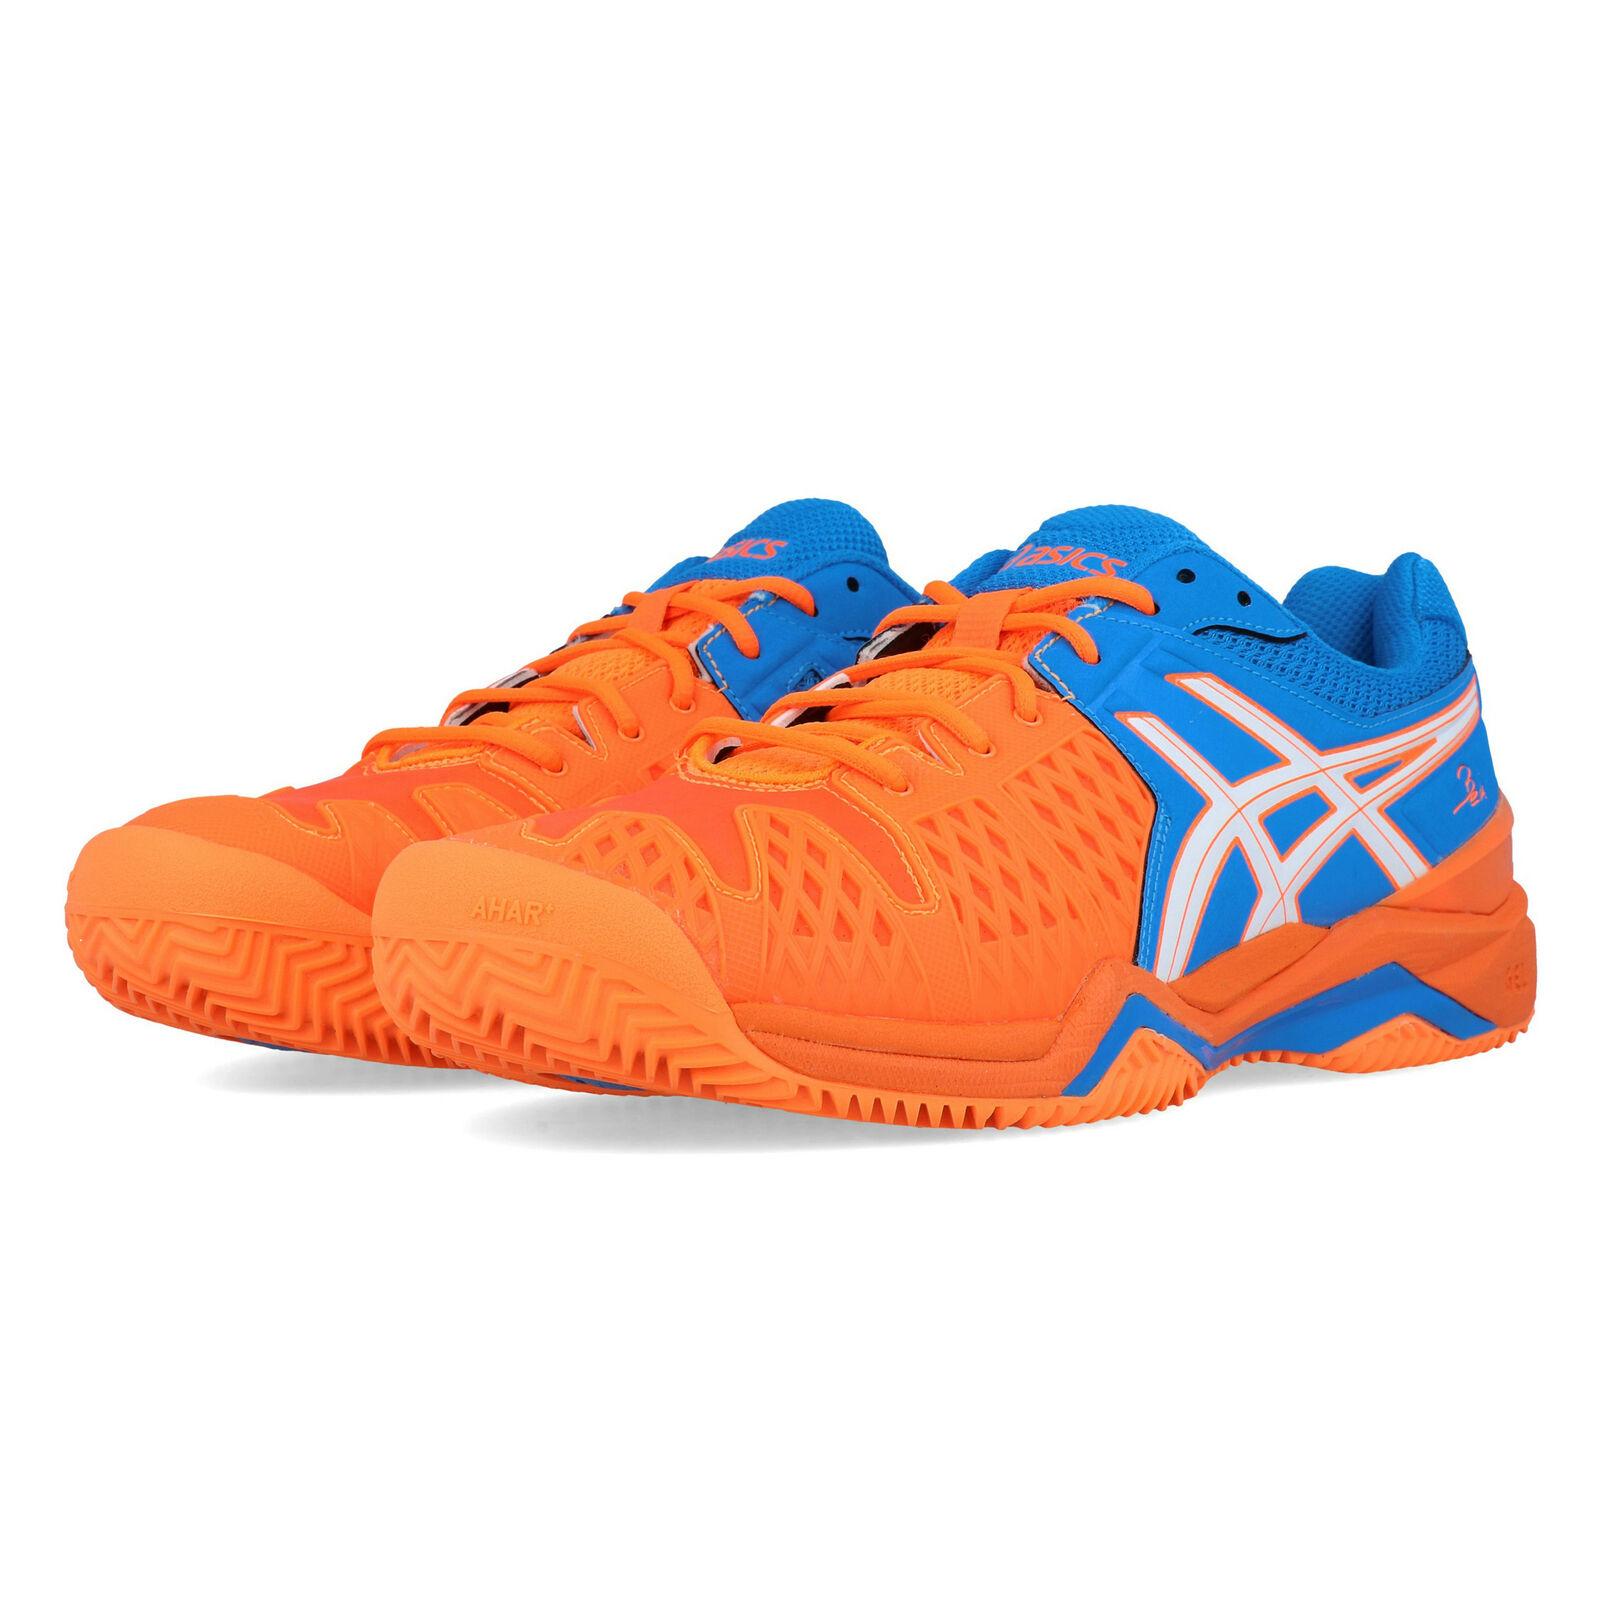 Asics mannens Gel-Bela 5 SG Tennis schoen blauw oranje Sports Breatabable